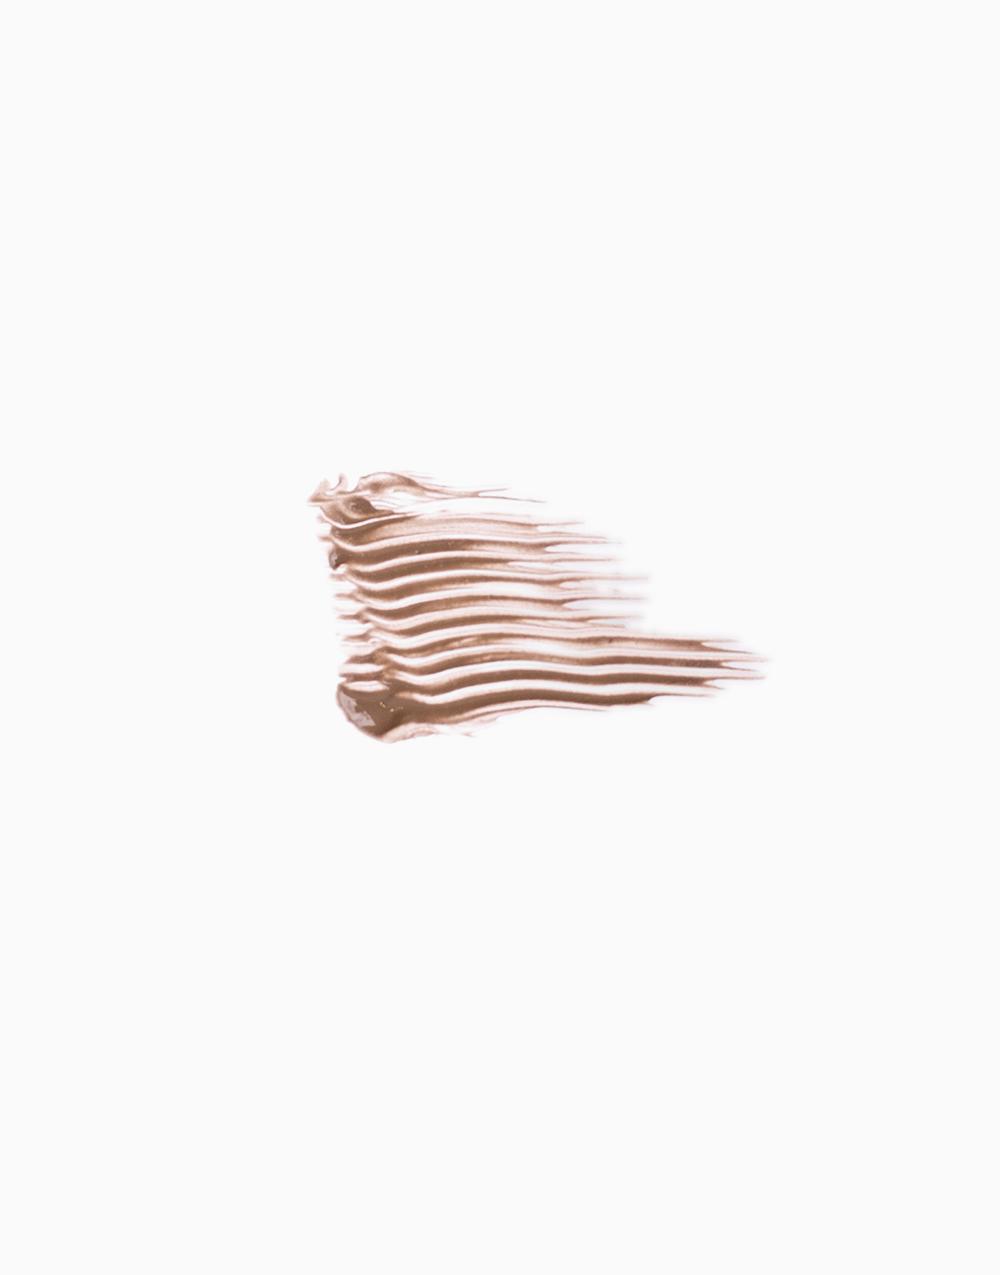 Brow Stick Pencil + Mascara by BLK Cosmetics | NaturaL Brown